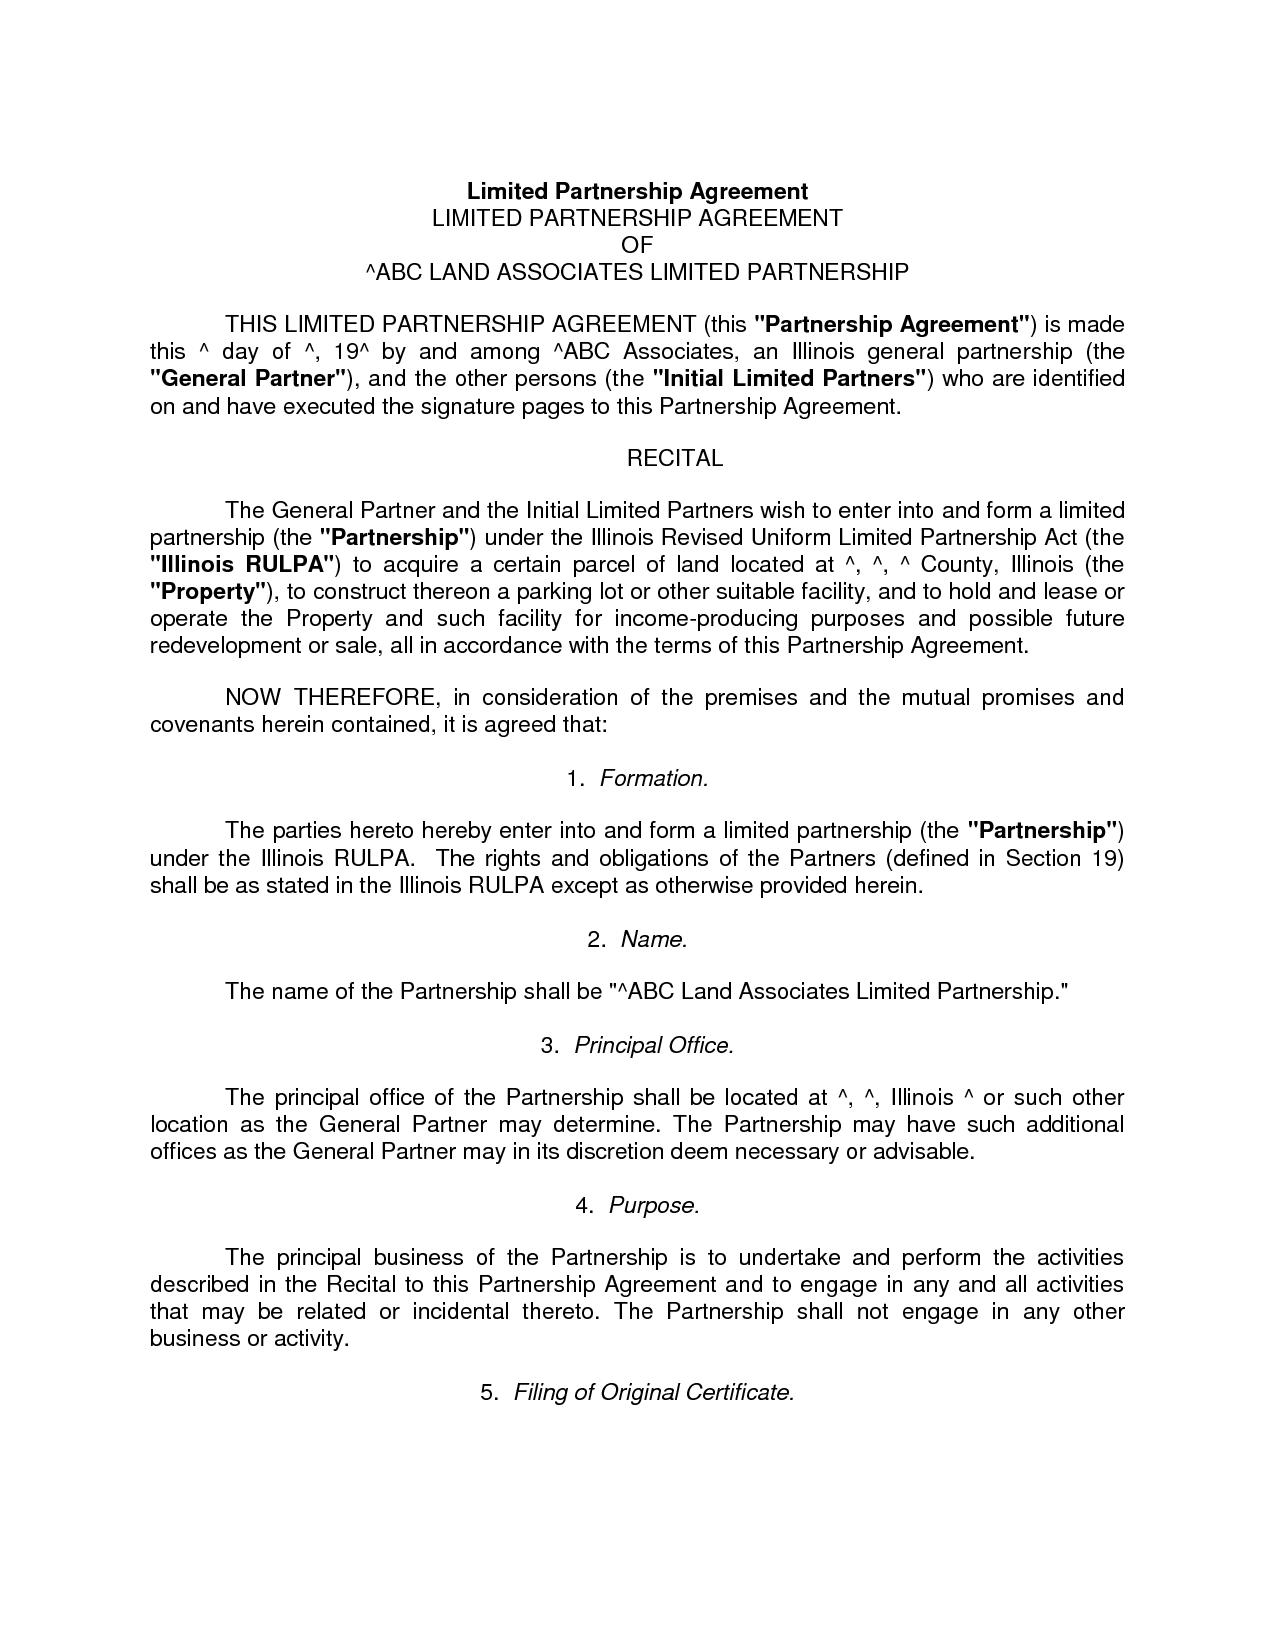 Dissolution Agreement Template Doc Downloadzdn Within Dissolution Of Partnership Agreement Template